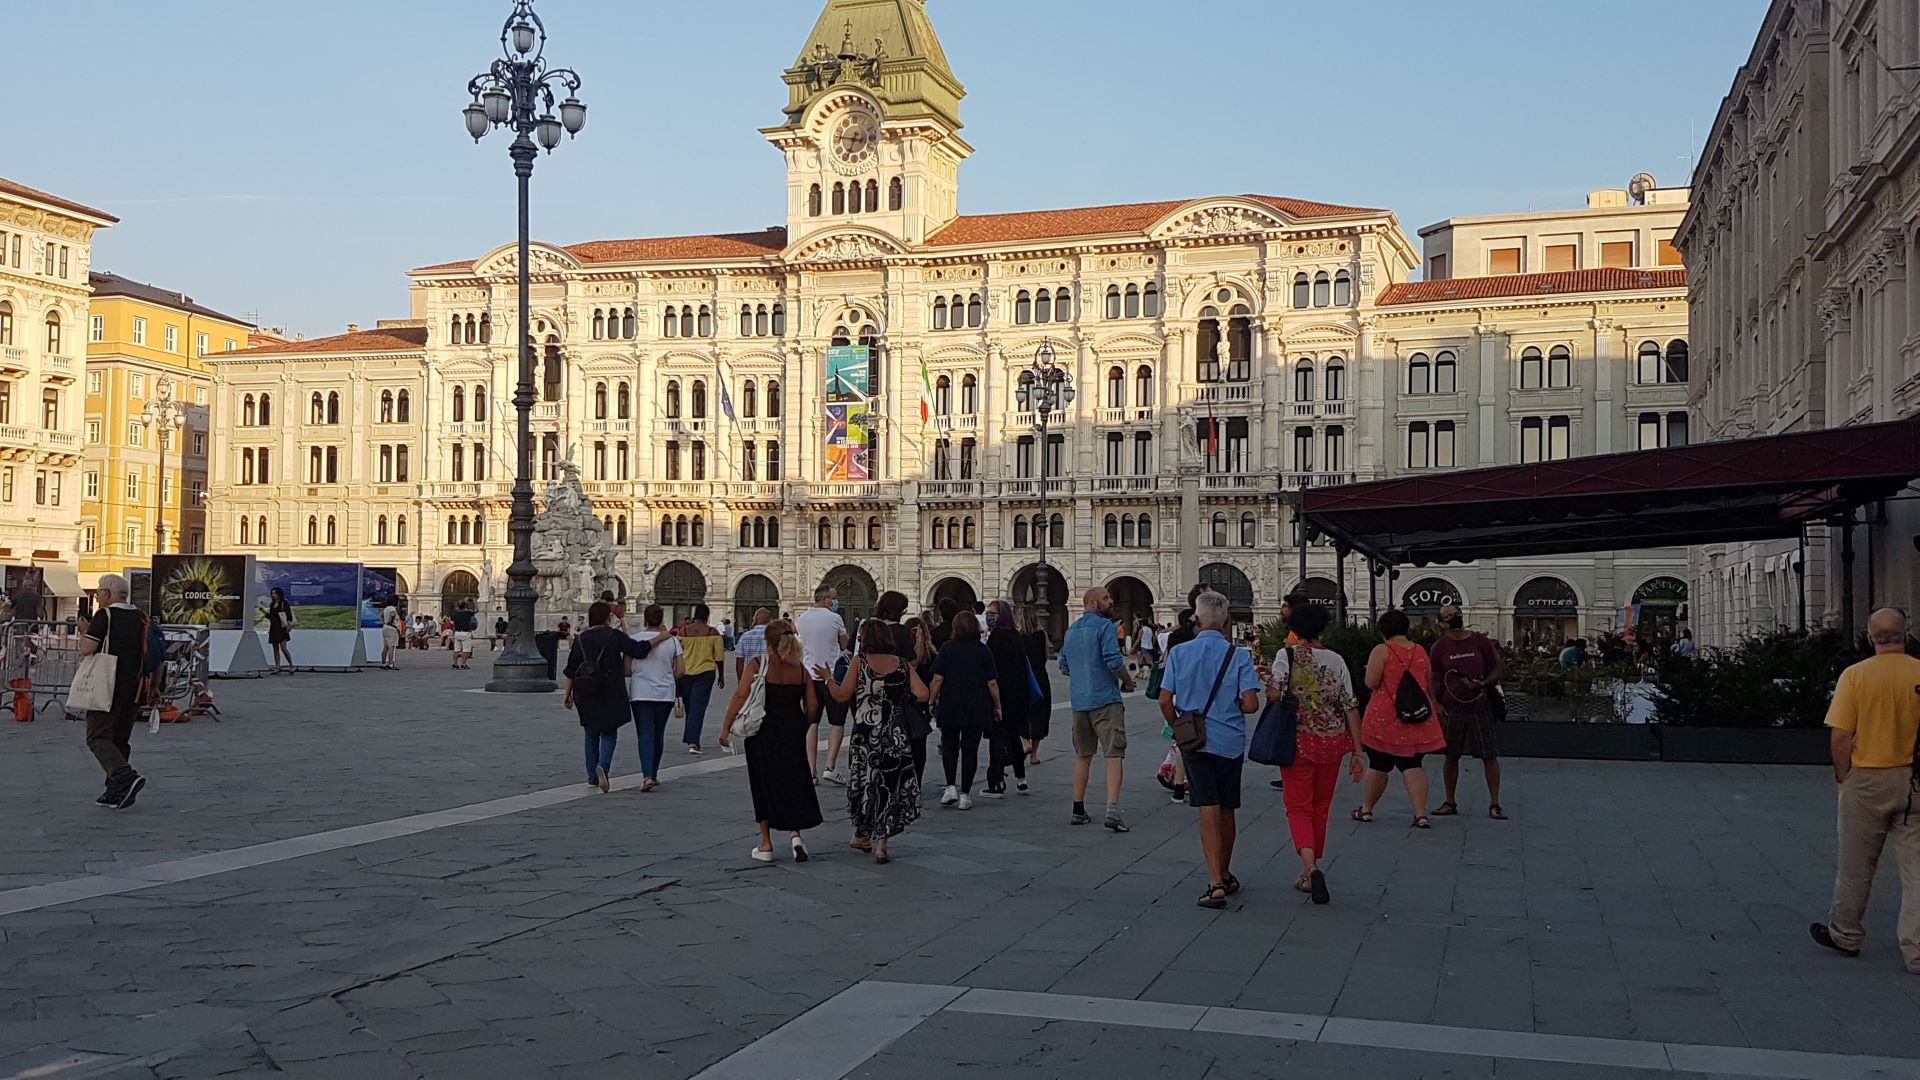 Trieste Arcana, Trieste del mistero